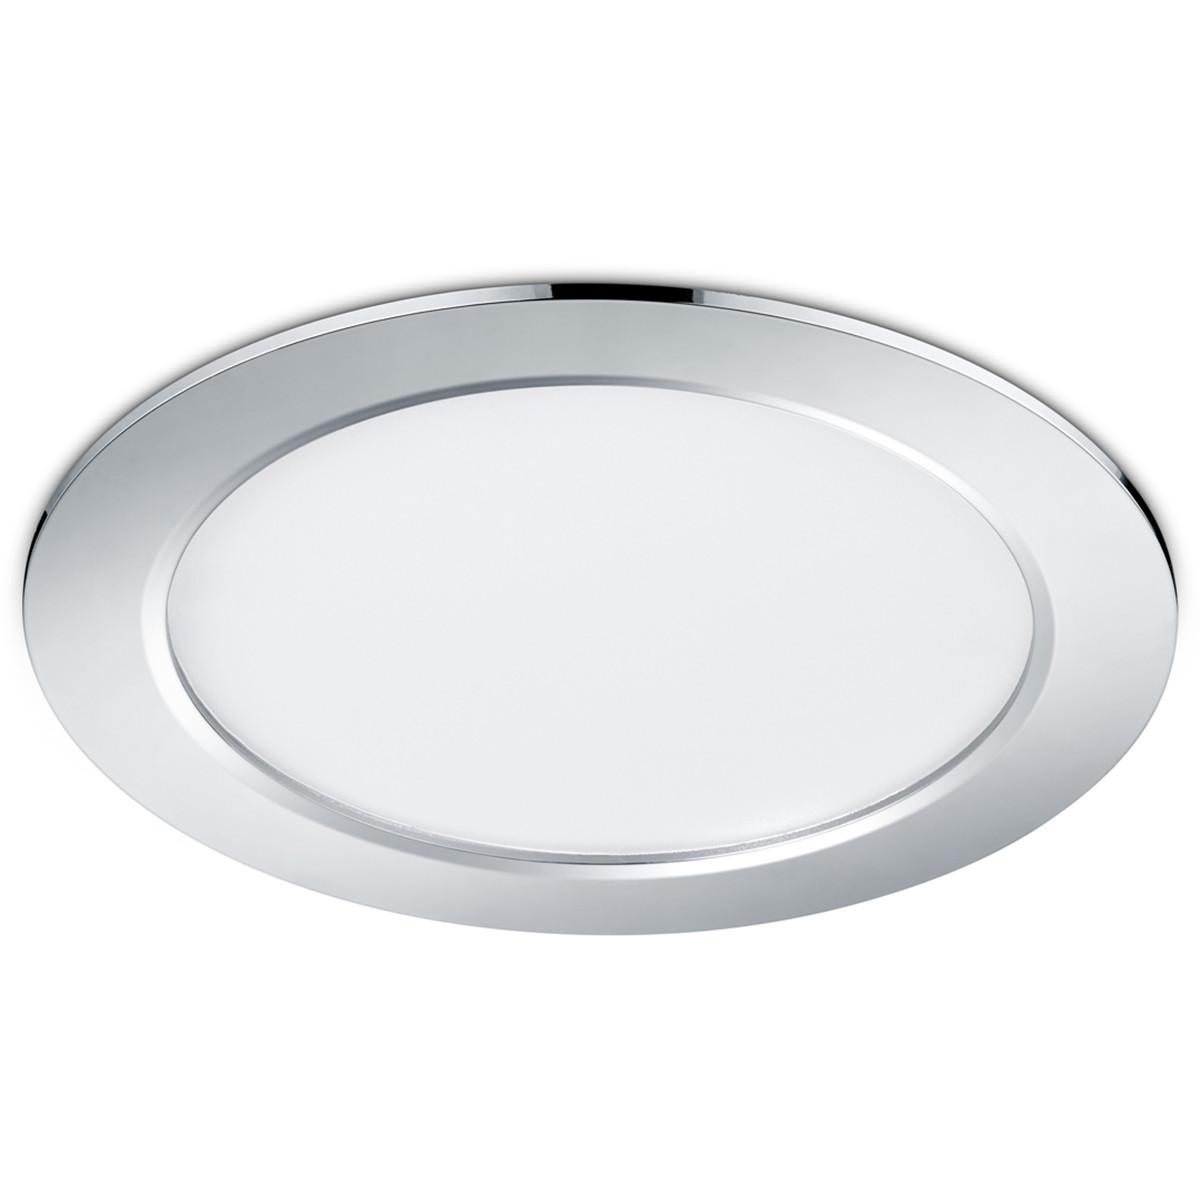 LED Spot - Inbouwspot - Trion Pandus - 18W - Warm Wit 3000K - Rond - Mat Chroom - Aluminium - Ø220mm